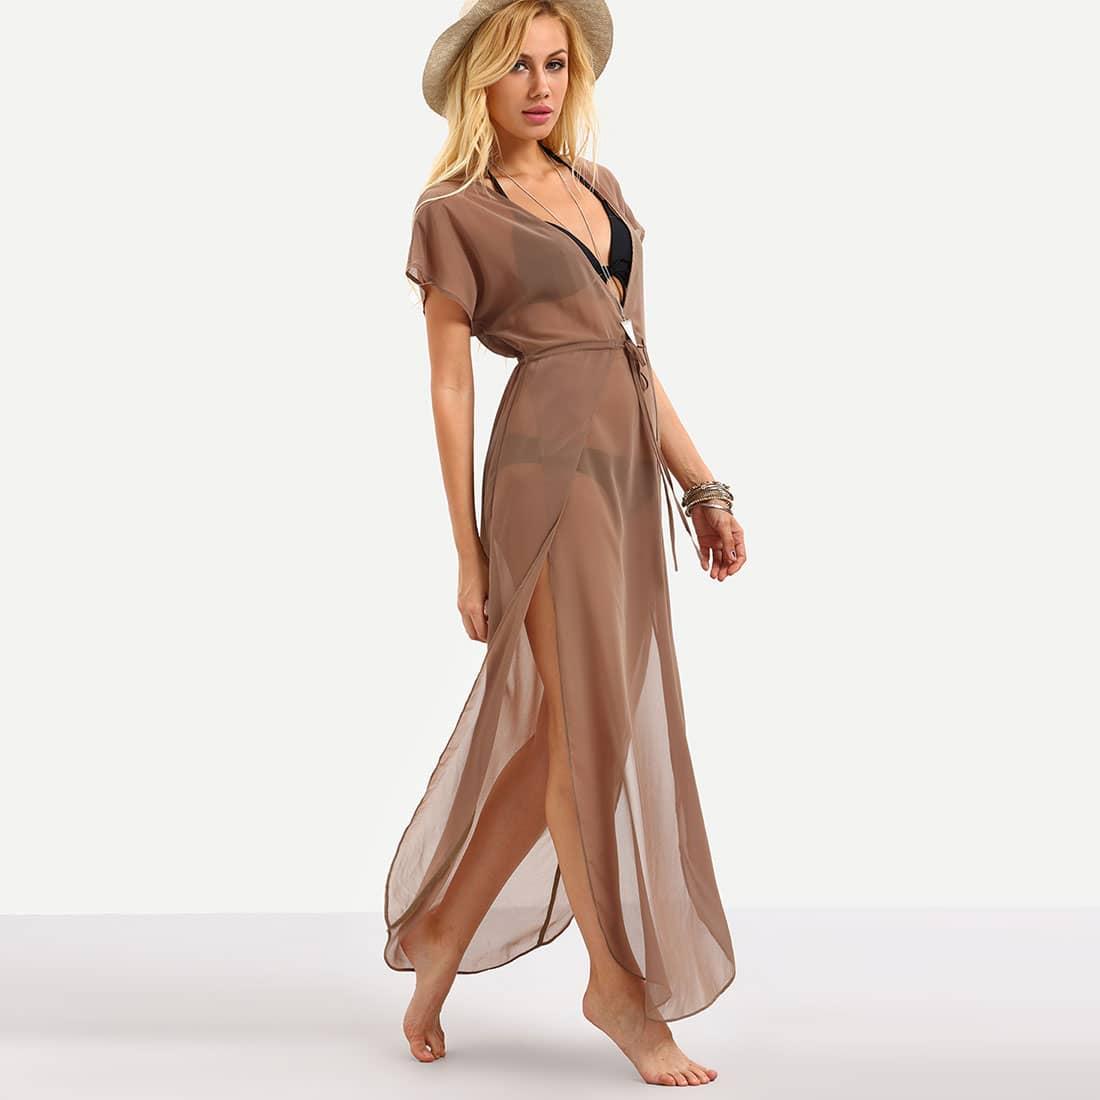 Plunging V-Neckline Drawstring Waist Split Dress